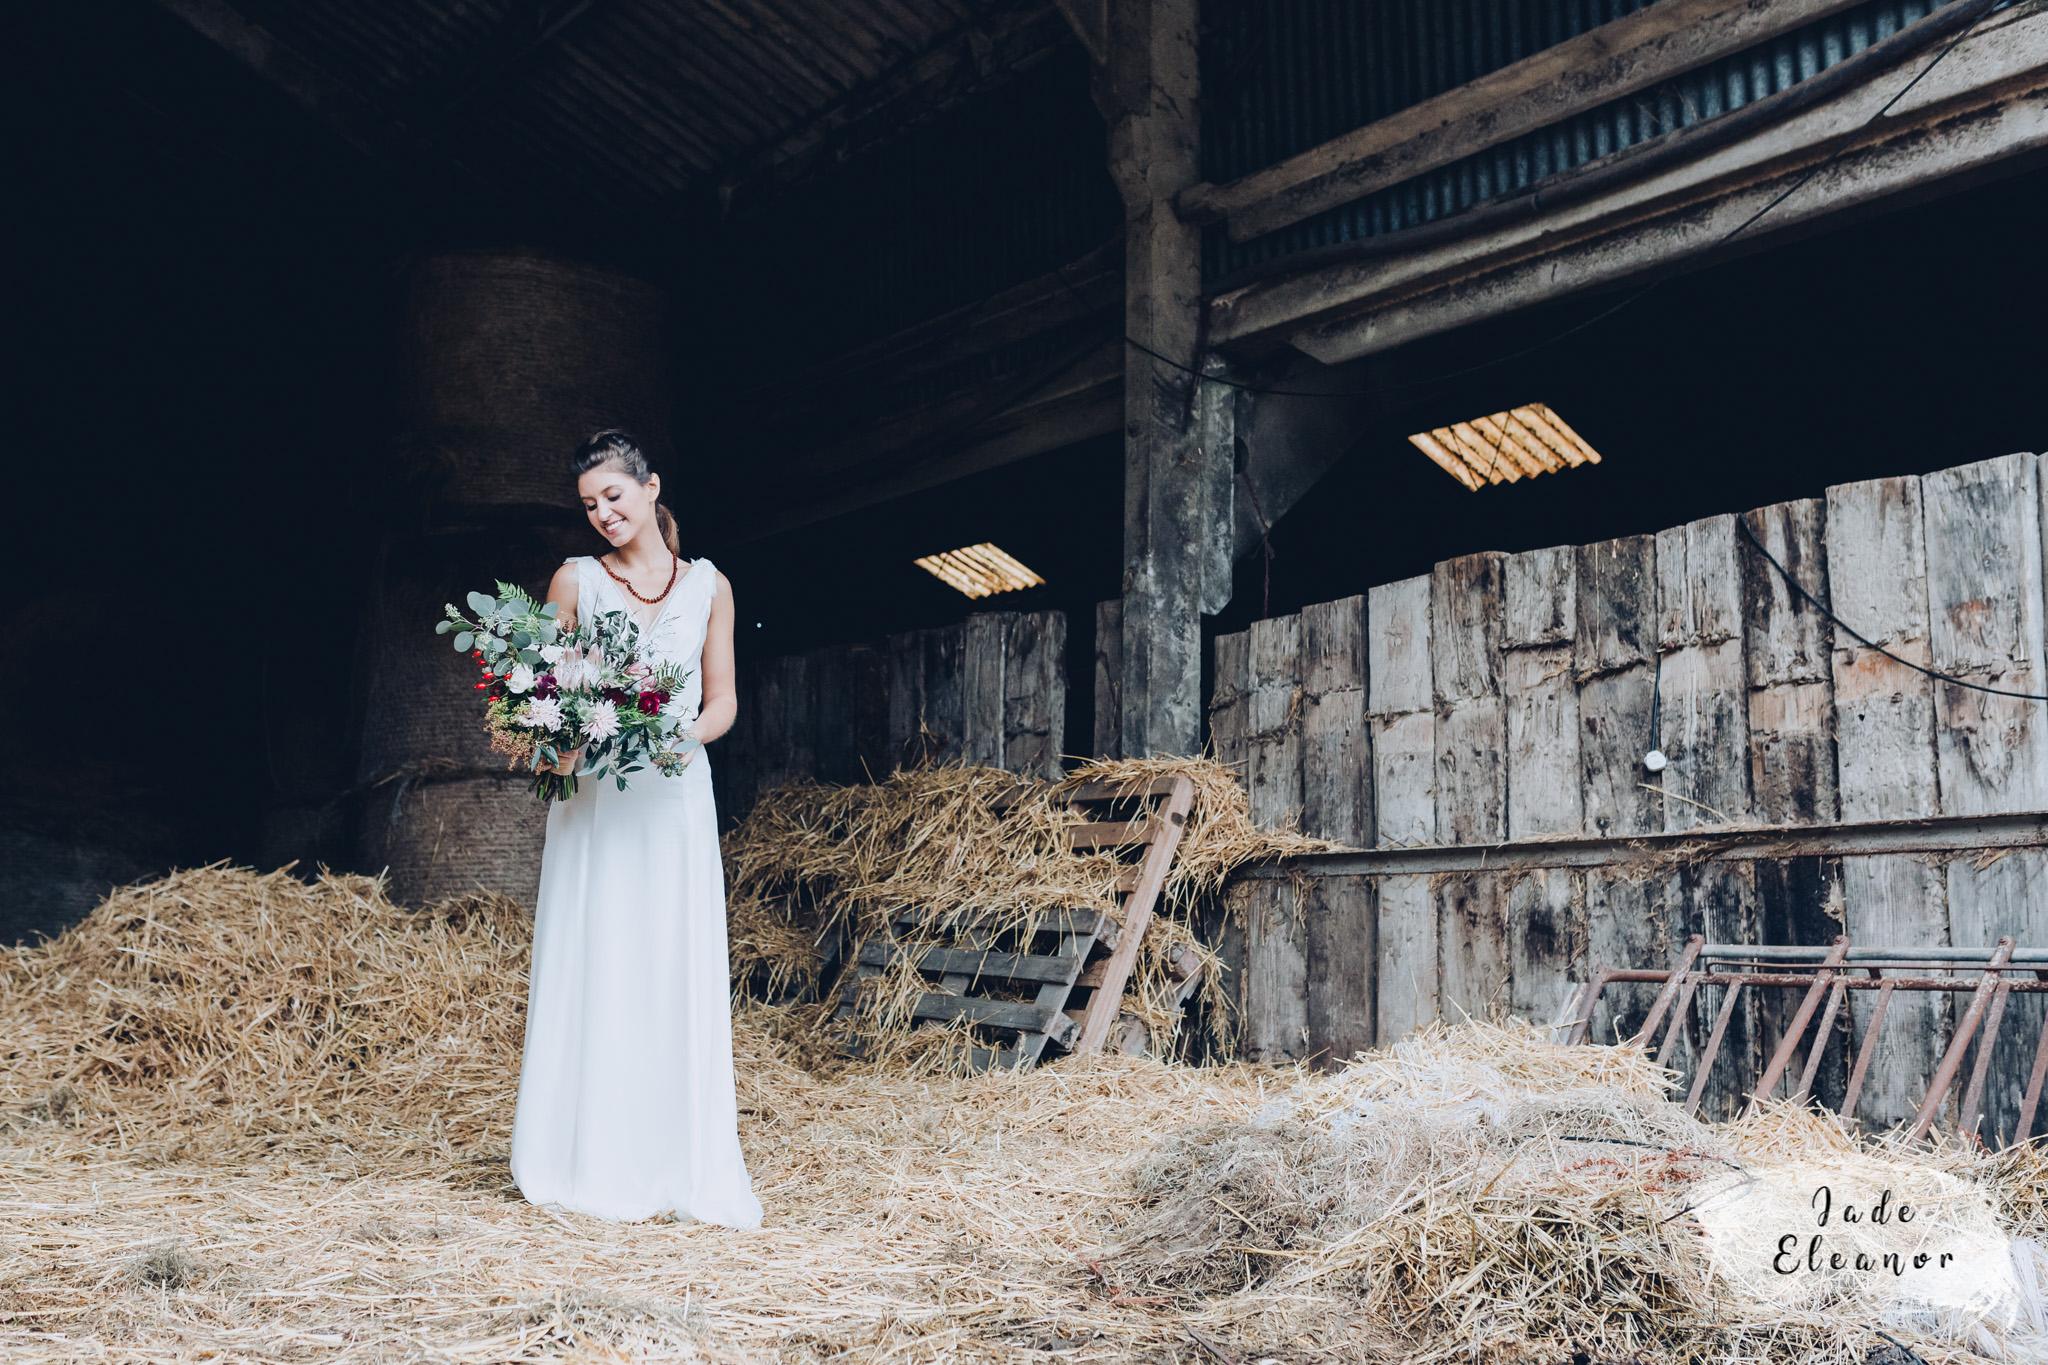 Bysshe Court Barn Wedding Jade Eleanor Photography-25.jpg